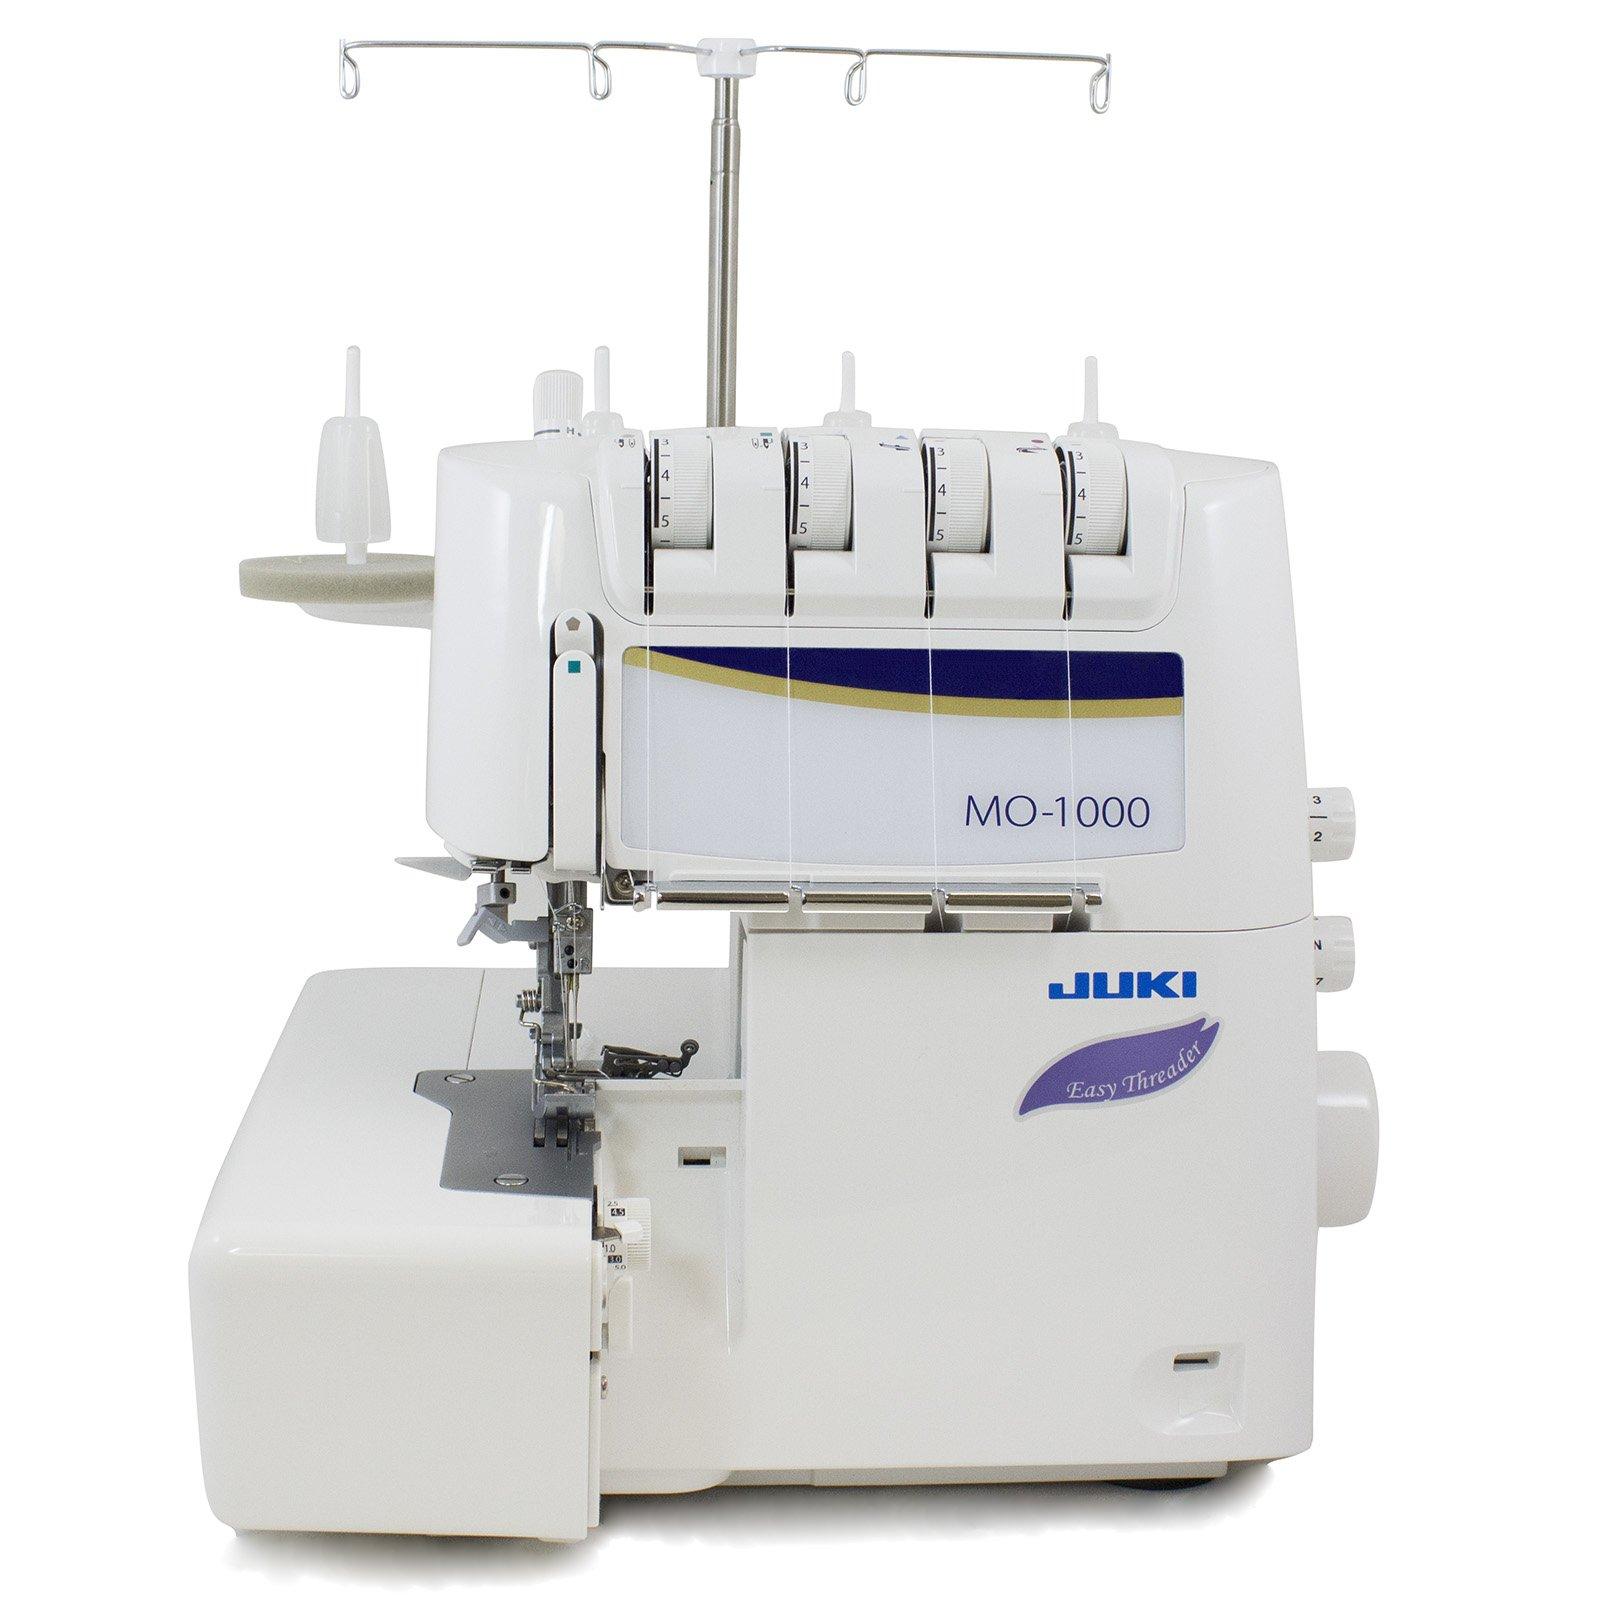 Juki MO-1000 Serger, Push Button Jet Air Looper Threader,purple product image